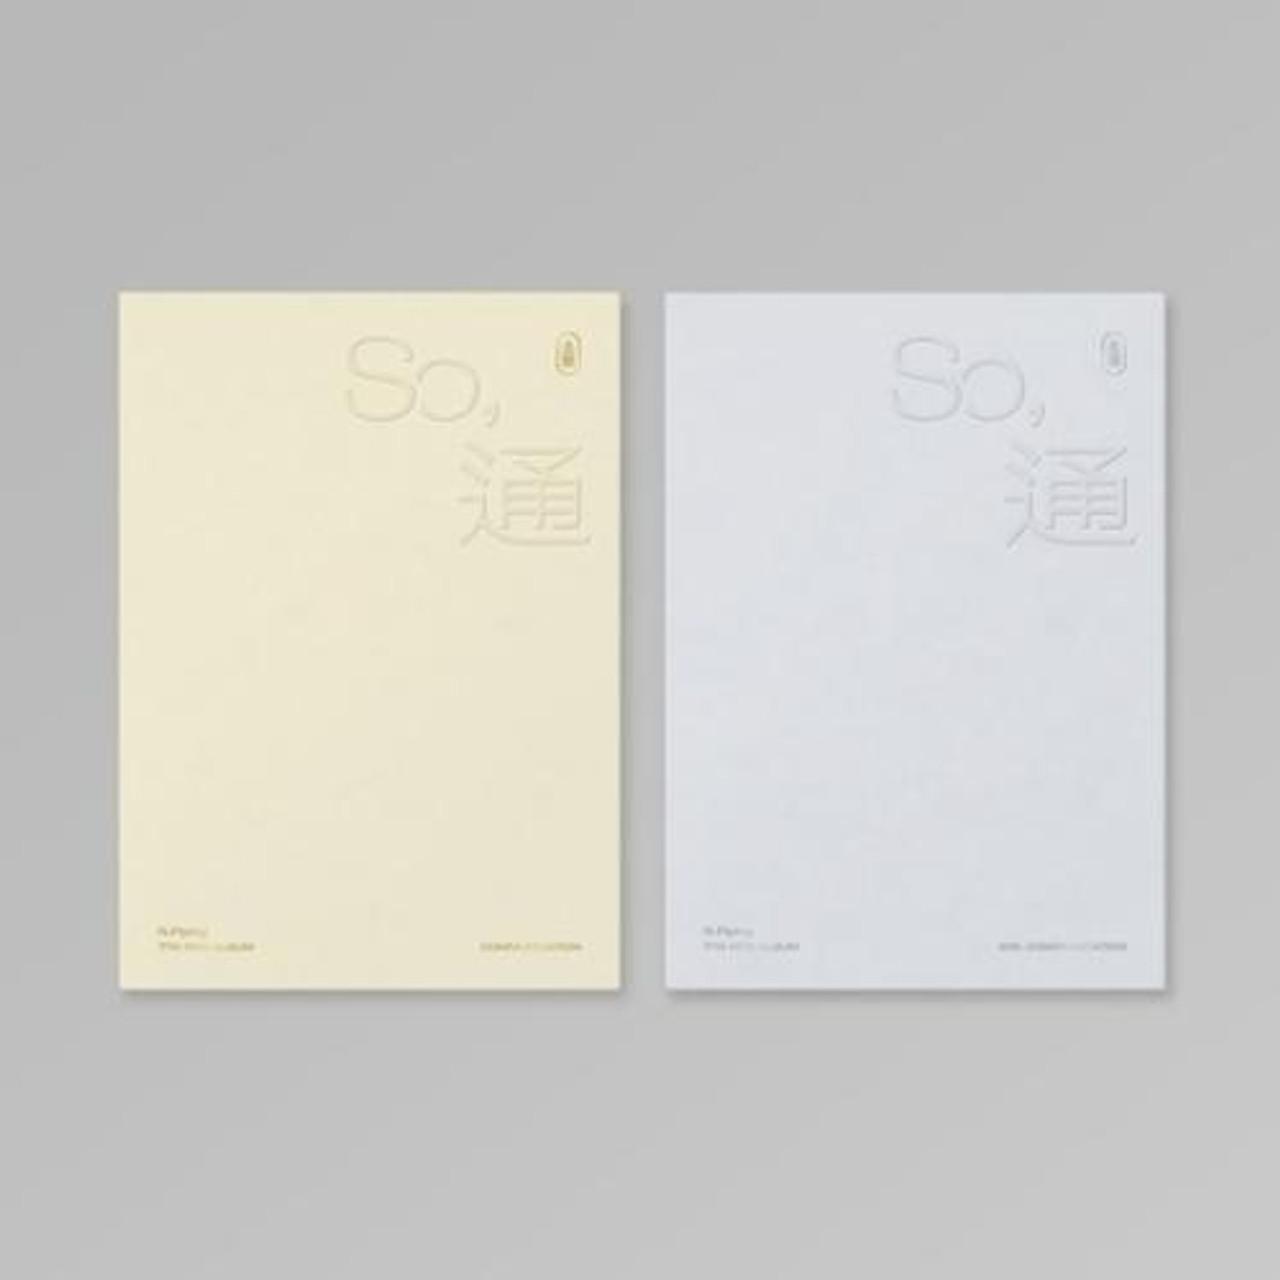 N.Flying - 7th Mini [So, 通 (소통)] Random ver. + Poster